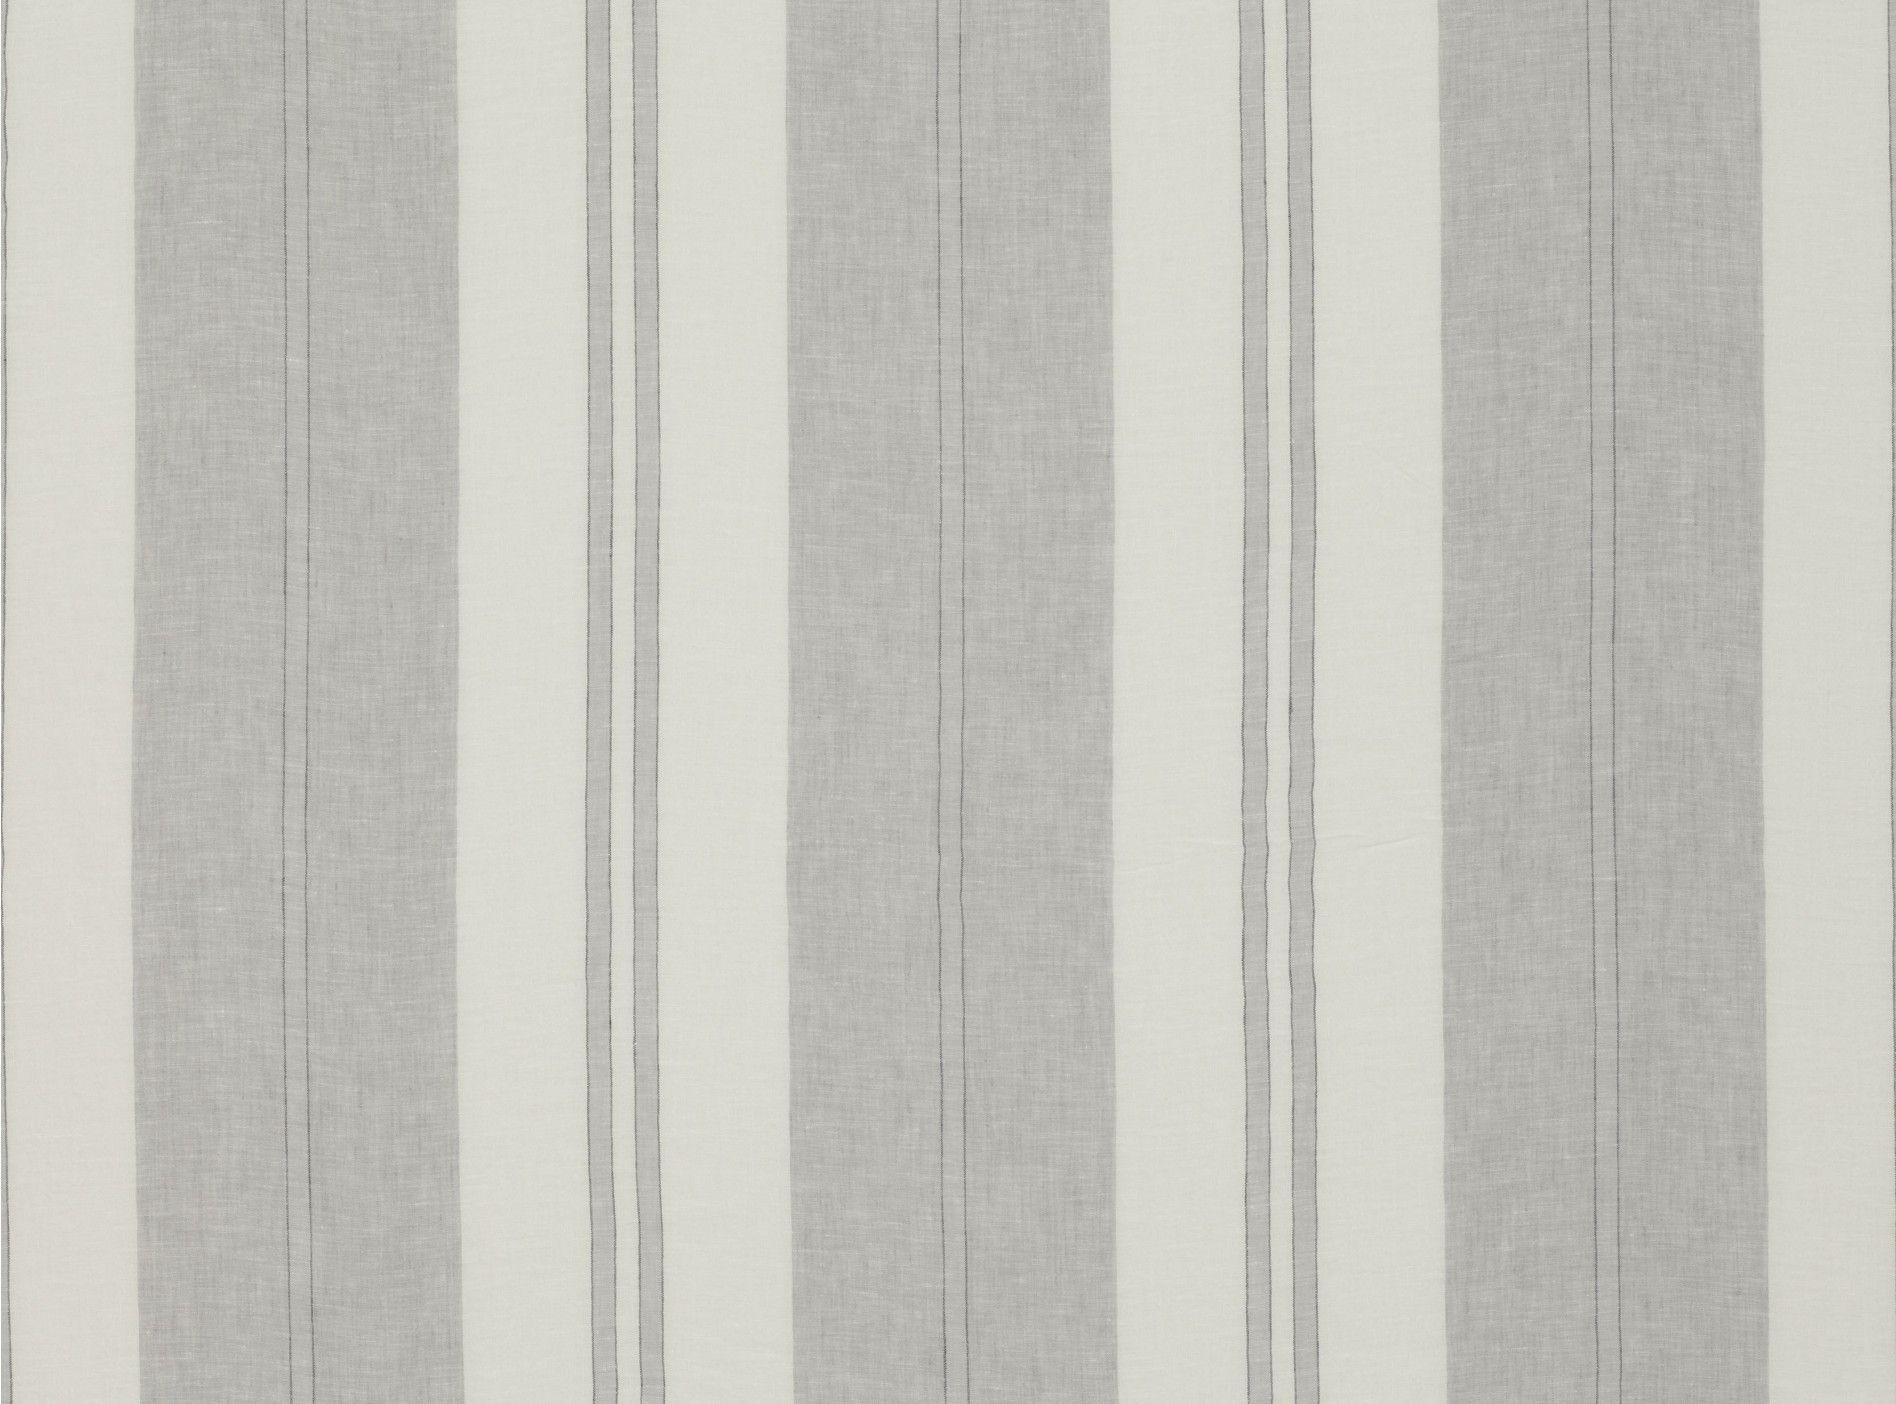 Palm Stripe Grey Mist Mark Alexander Fabric and Trim